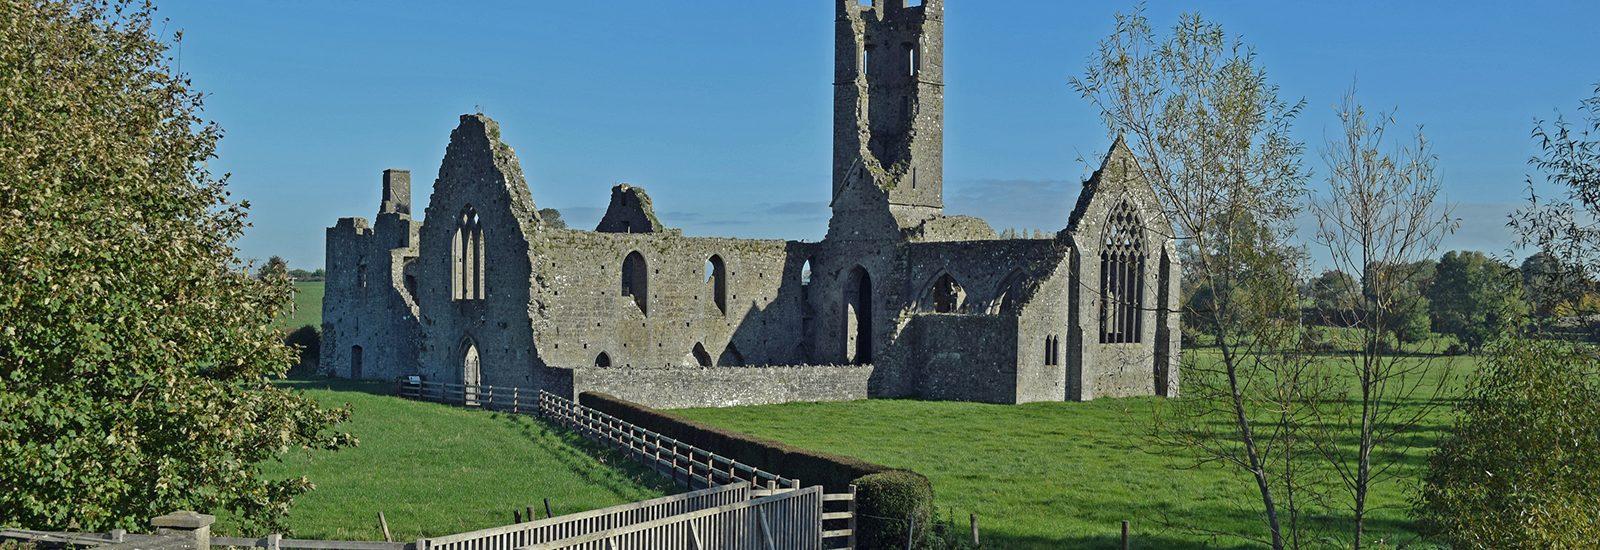 Kilmallock Abbey